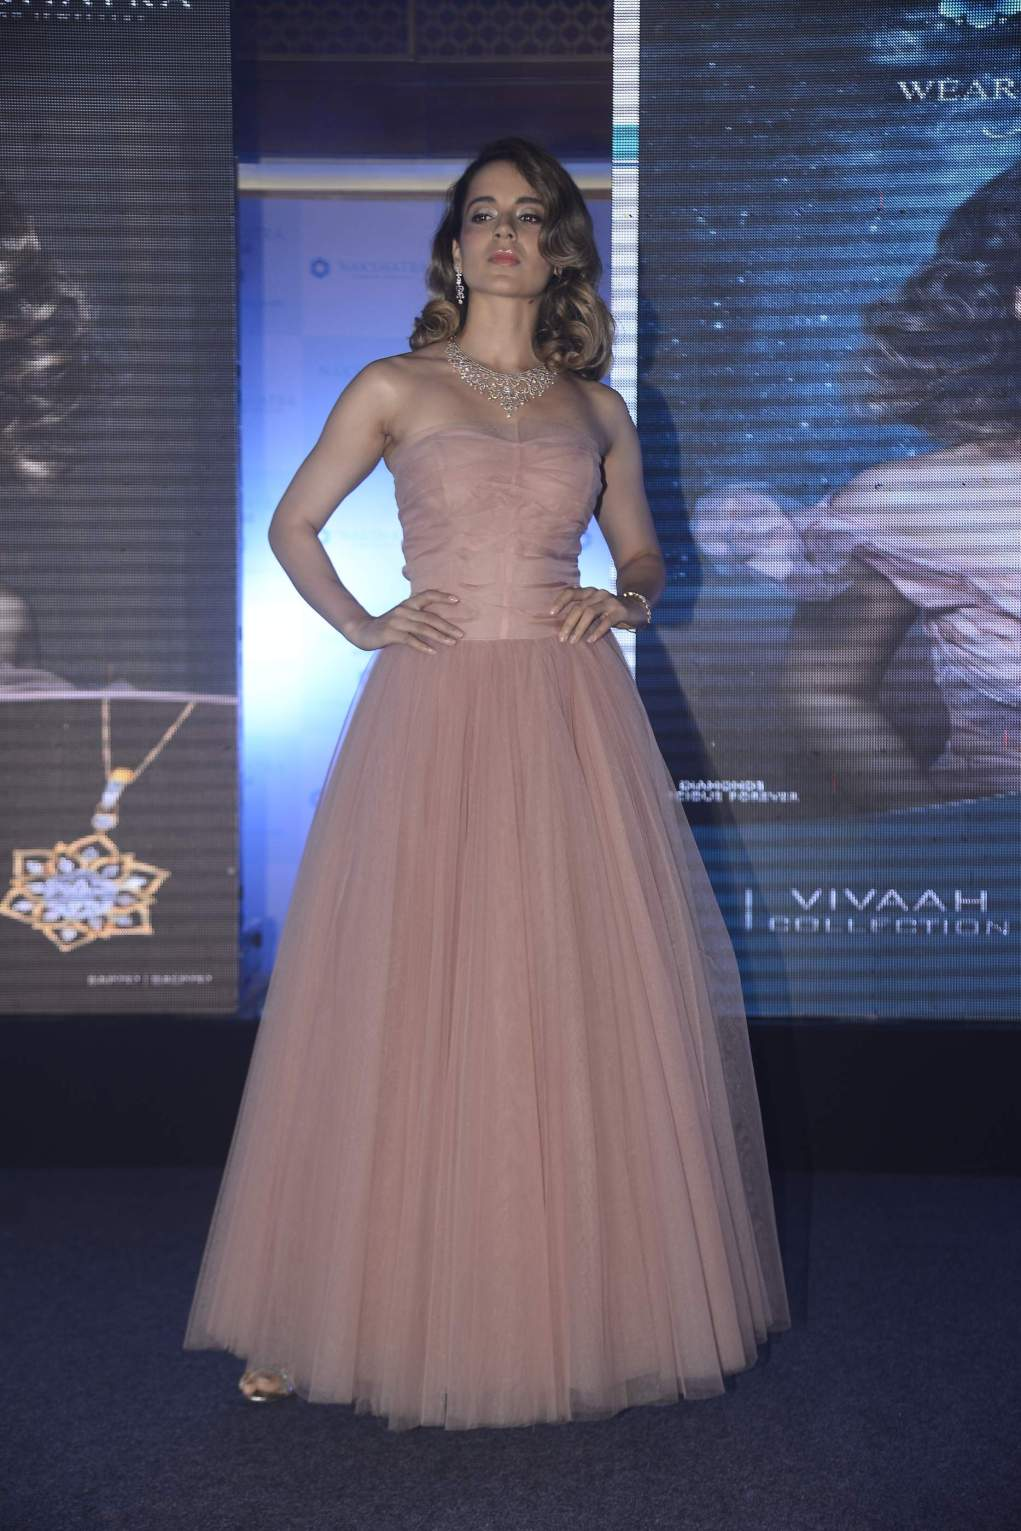 Kangana Ranaut Beautiful Kangana Ranaut Dazzles In Stunning Outfit | Nakshatra Kangana Nakshatra 4